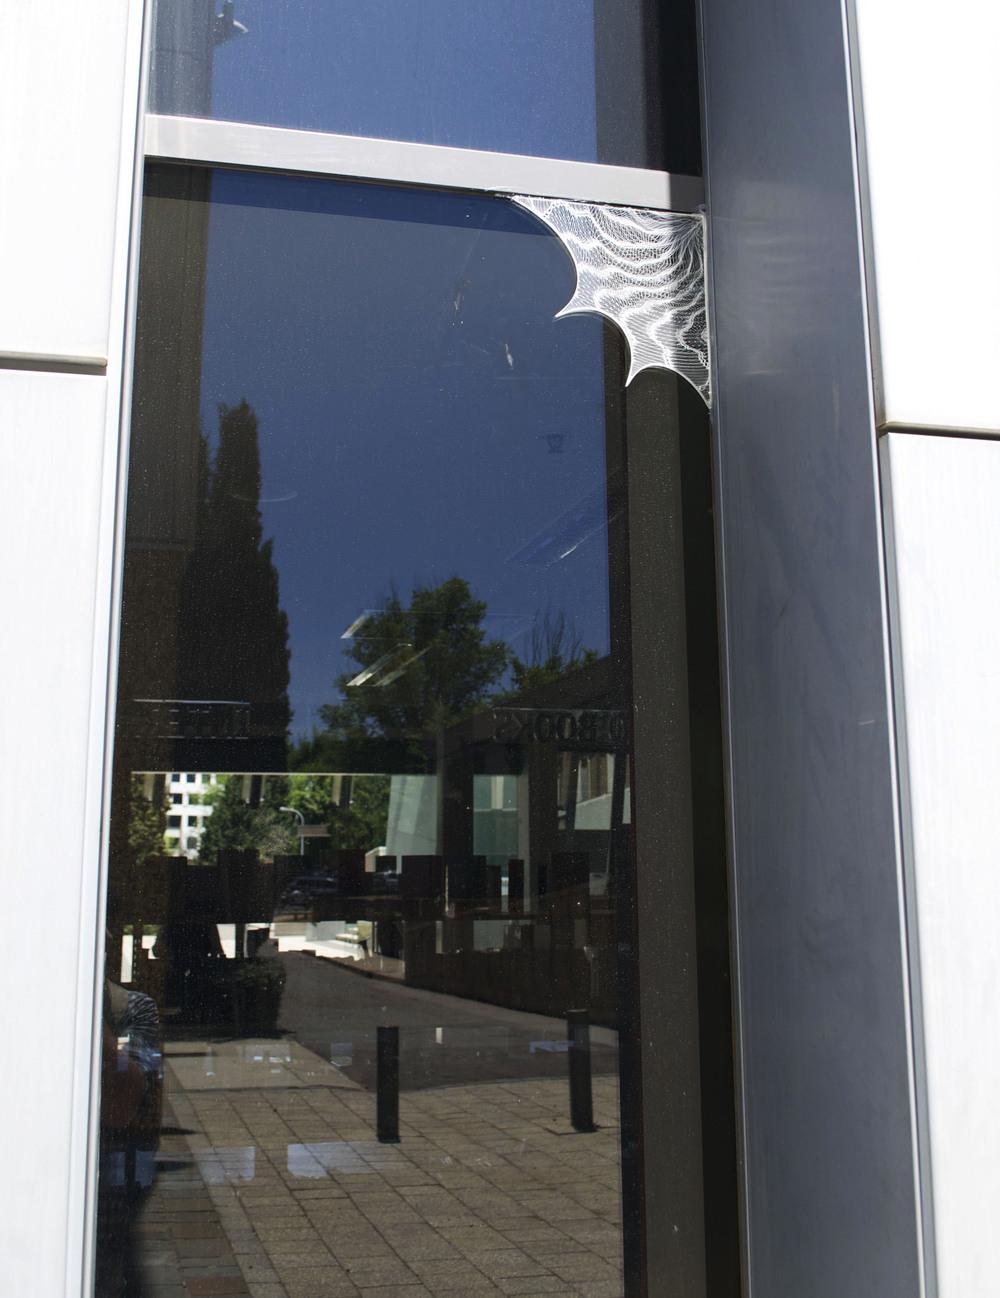 Cobweb - 2012